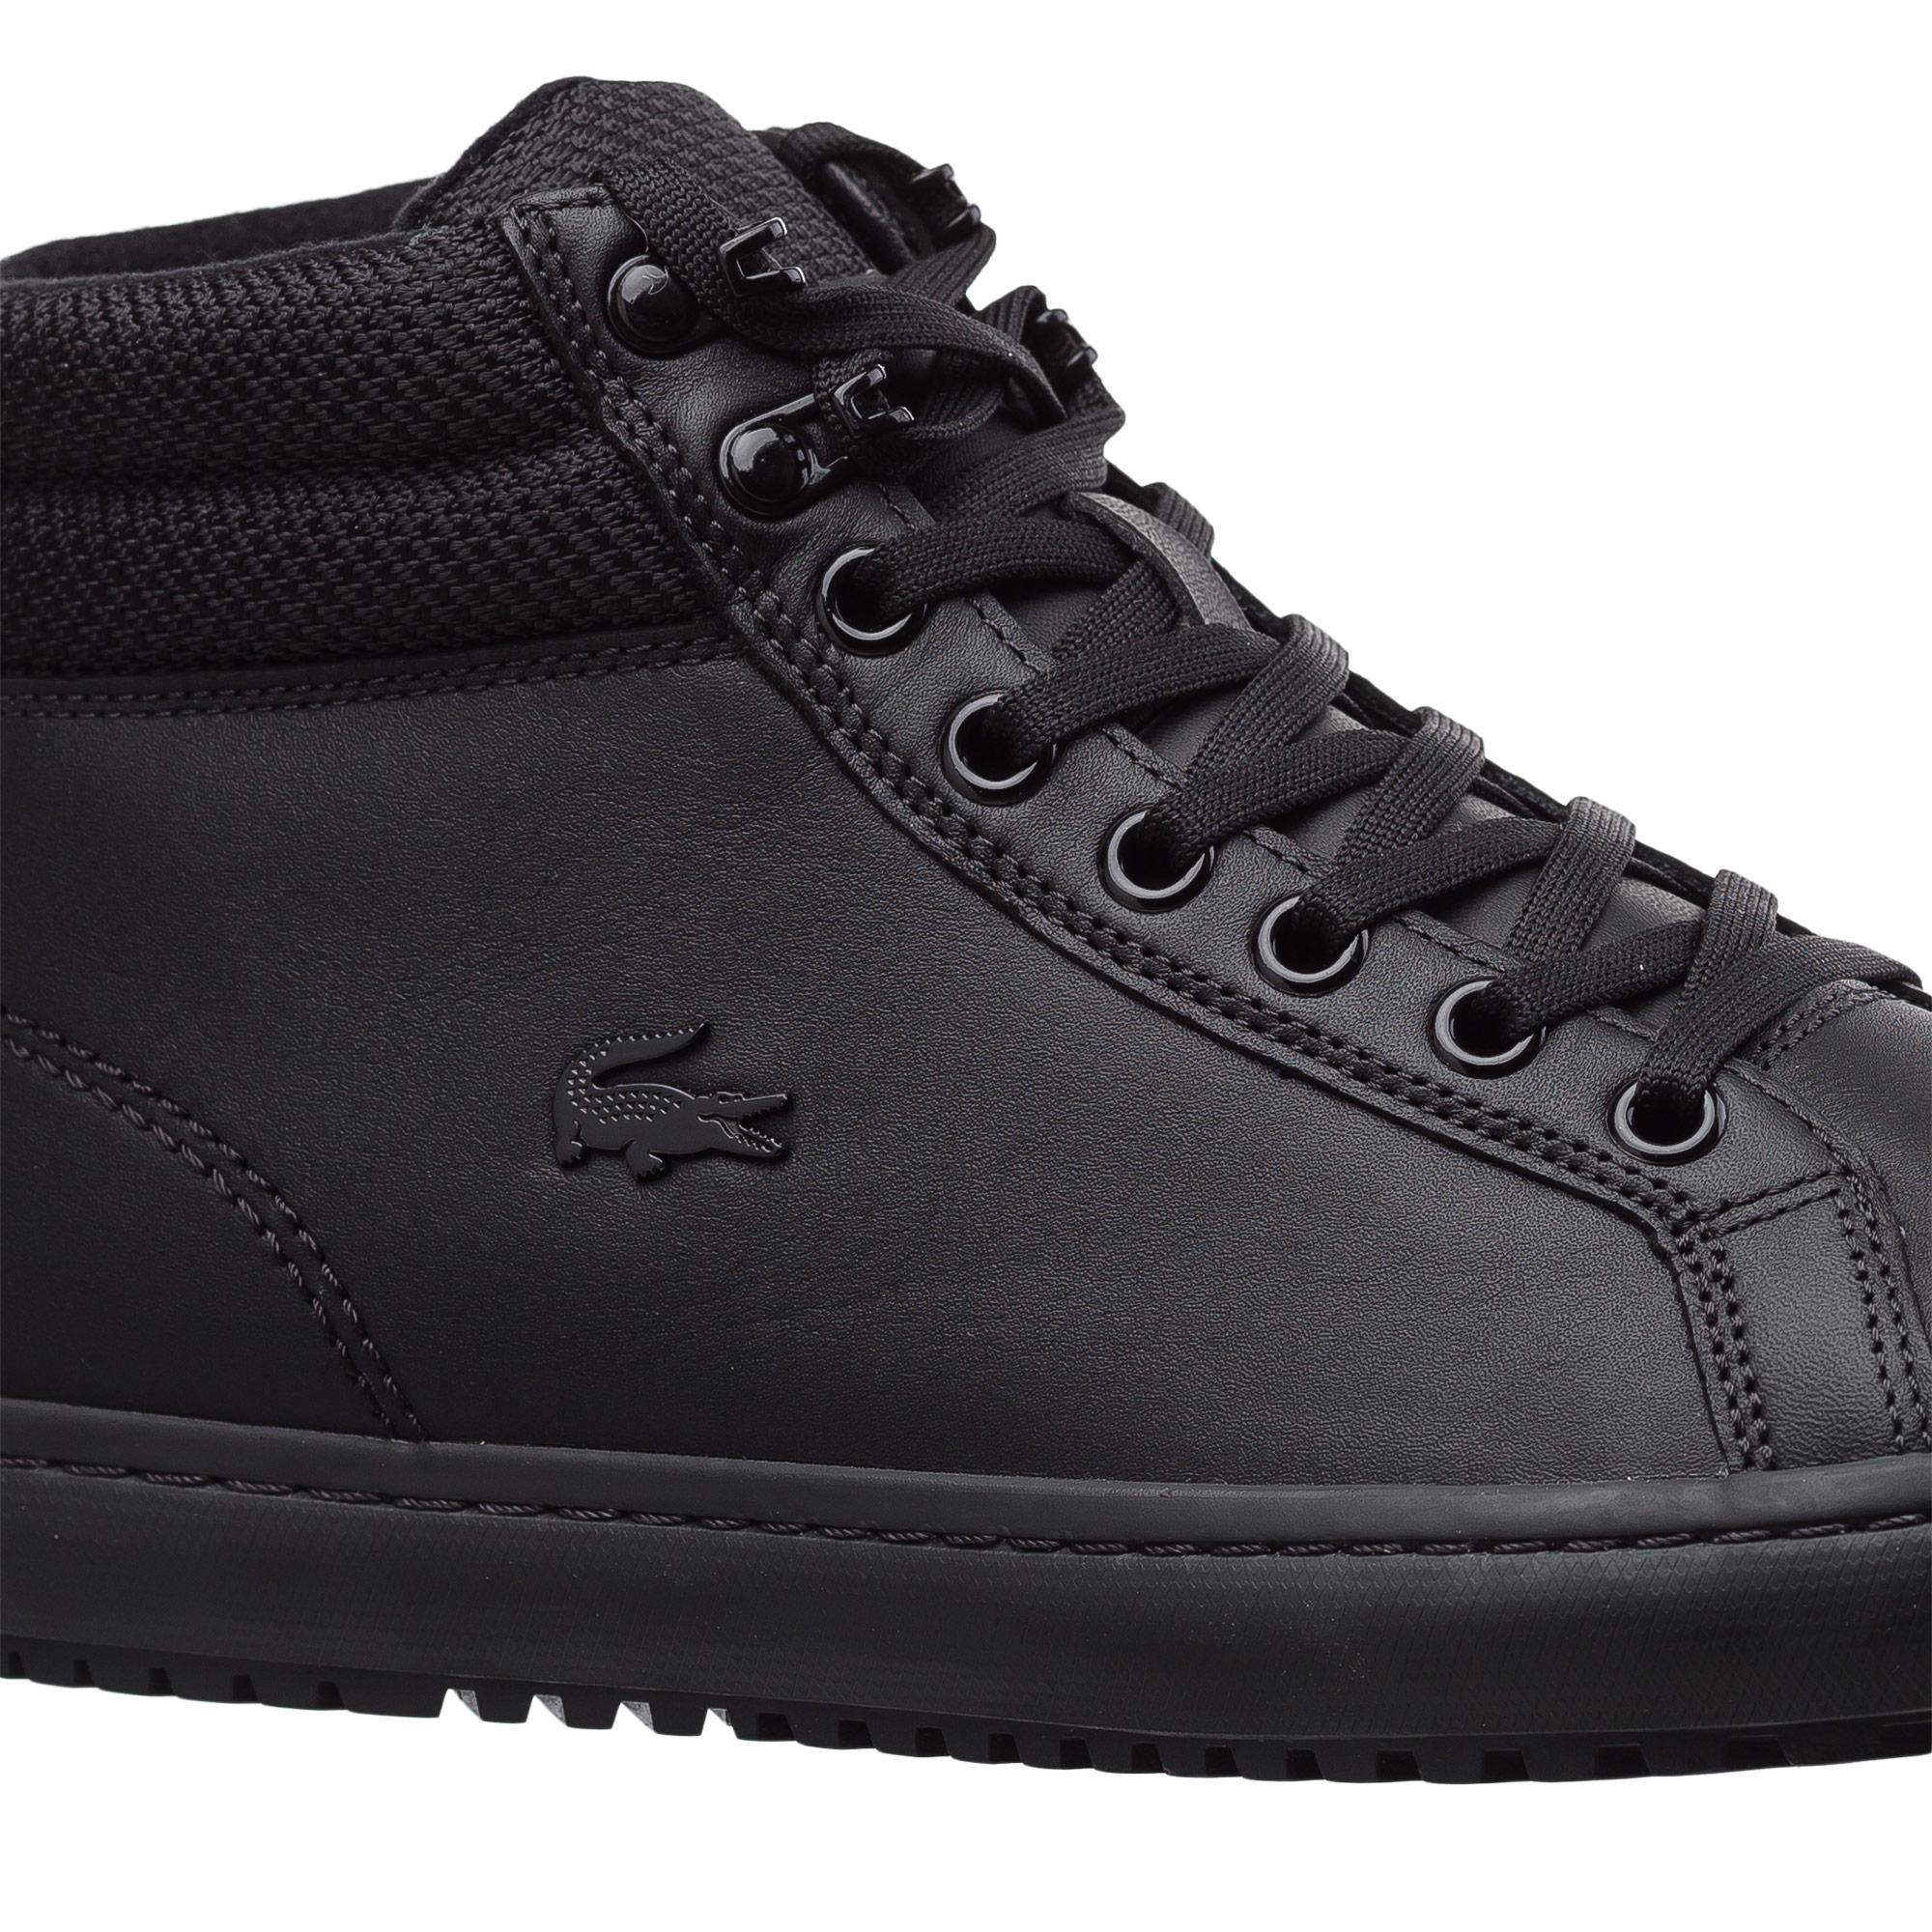 Lacoste Kadın Straightset Insulatec3181 Siyah Sneaker